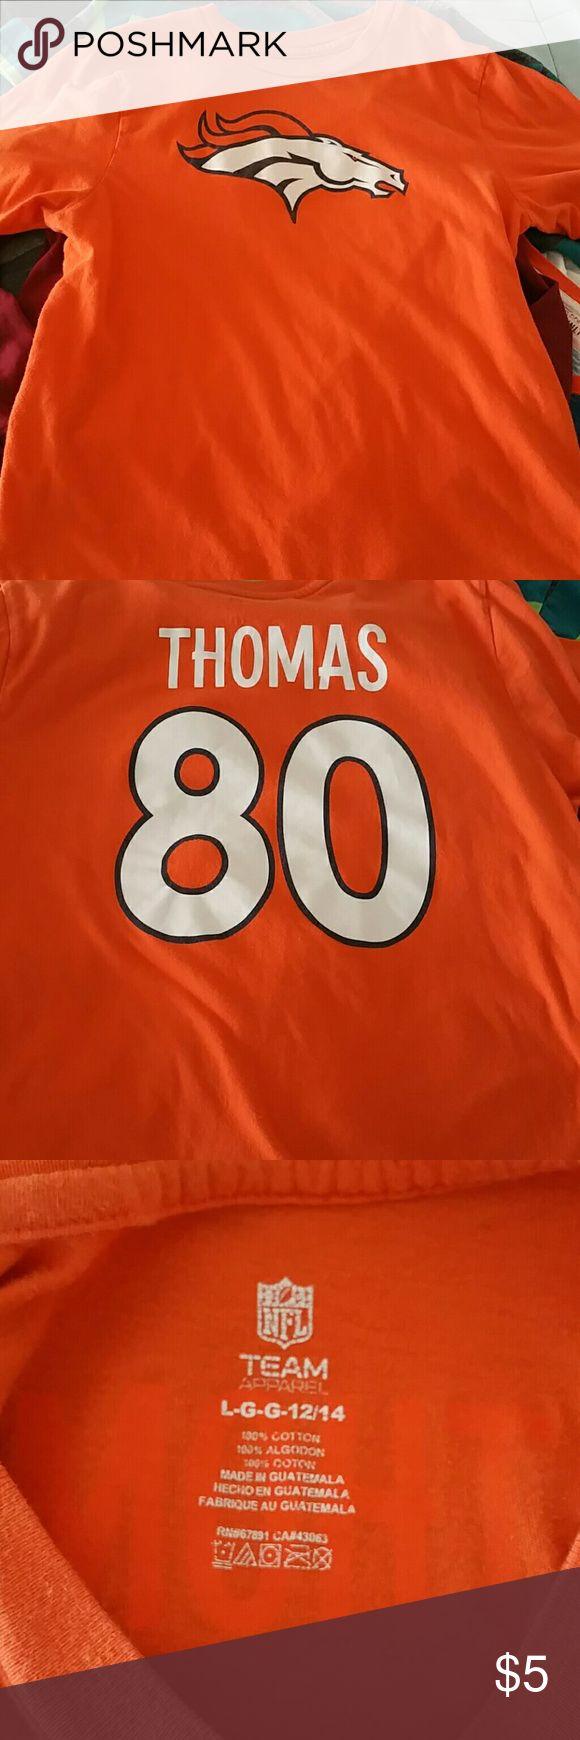 Broncos #80 t shirt Orange,  Julius Thomas. #80 t shirt NFL team apparel Shirts & Tops Tees - Short Sleeve